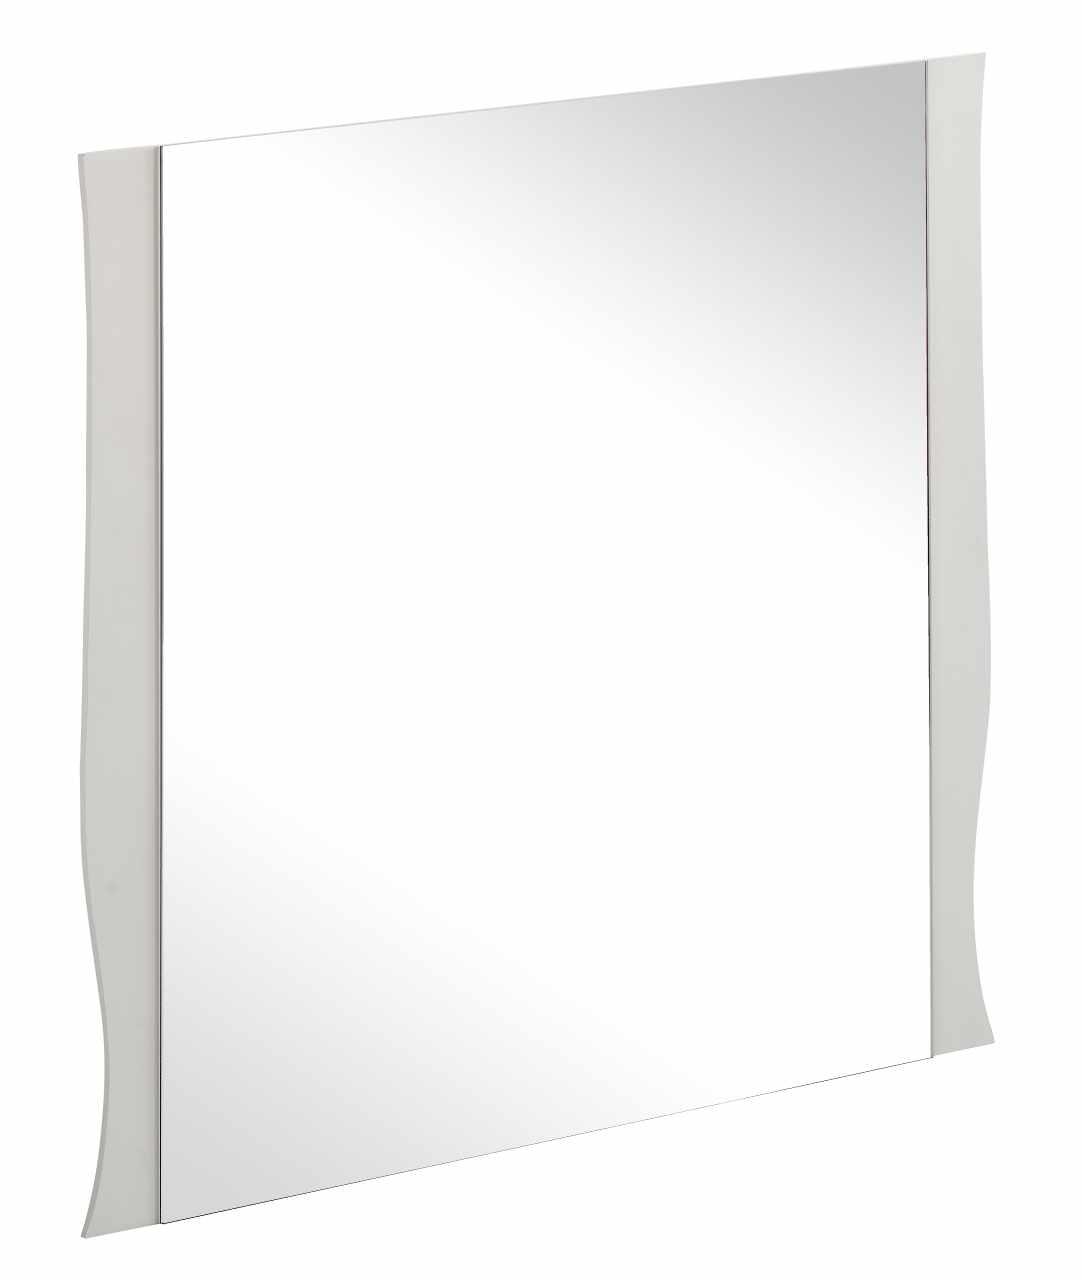 Oglinda pentru baie, l60xH80 cm, Elisabeth la pret 309 lei